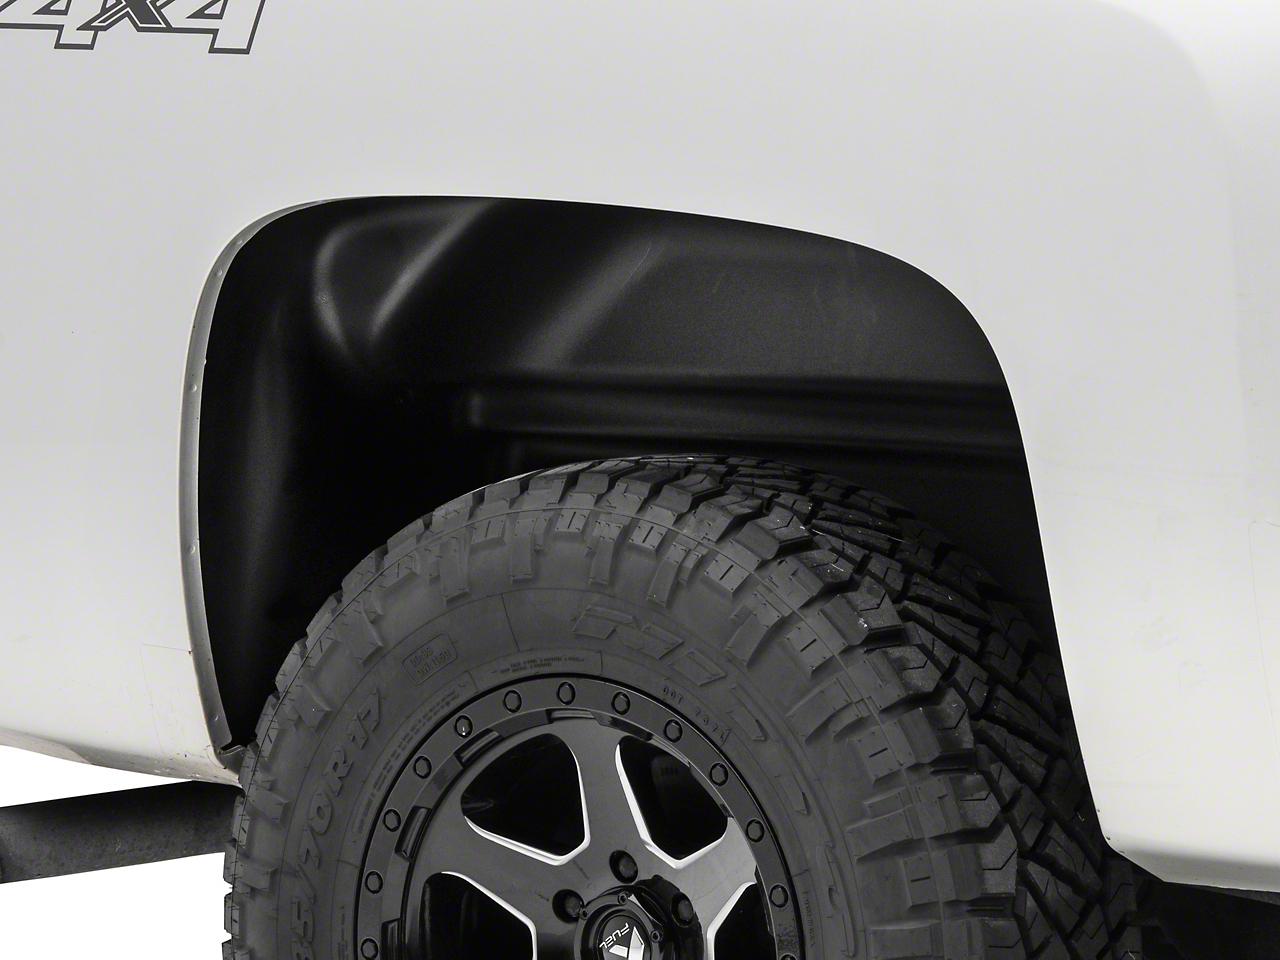 Husky Rear Wheel Well Guards - Black (07-13 Silverado 1500)